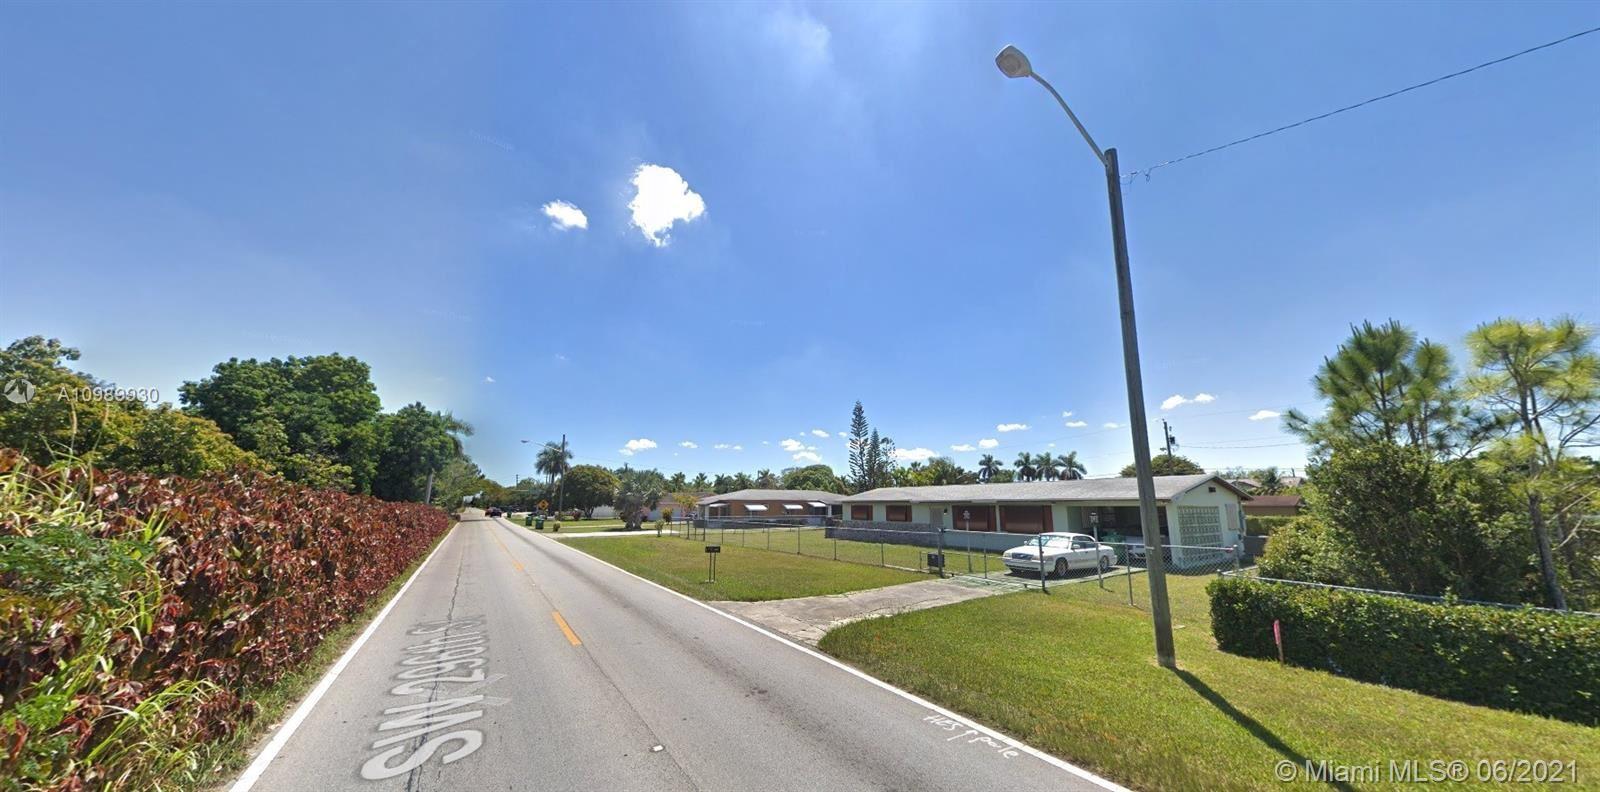 17770 SW 296 St, Homestead, FL 33030 - #: A10989930